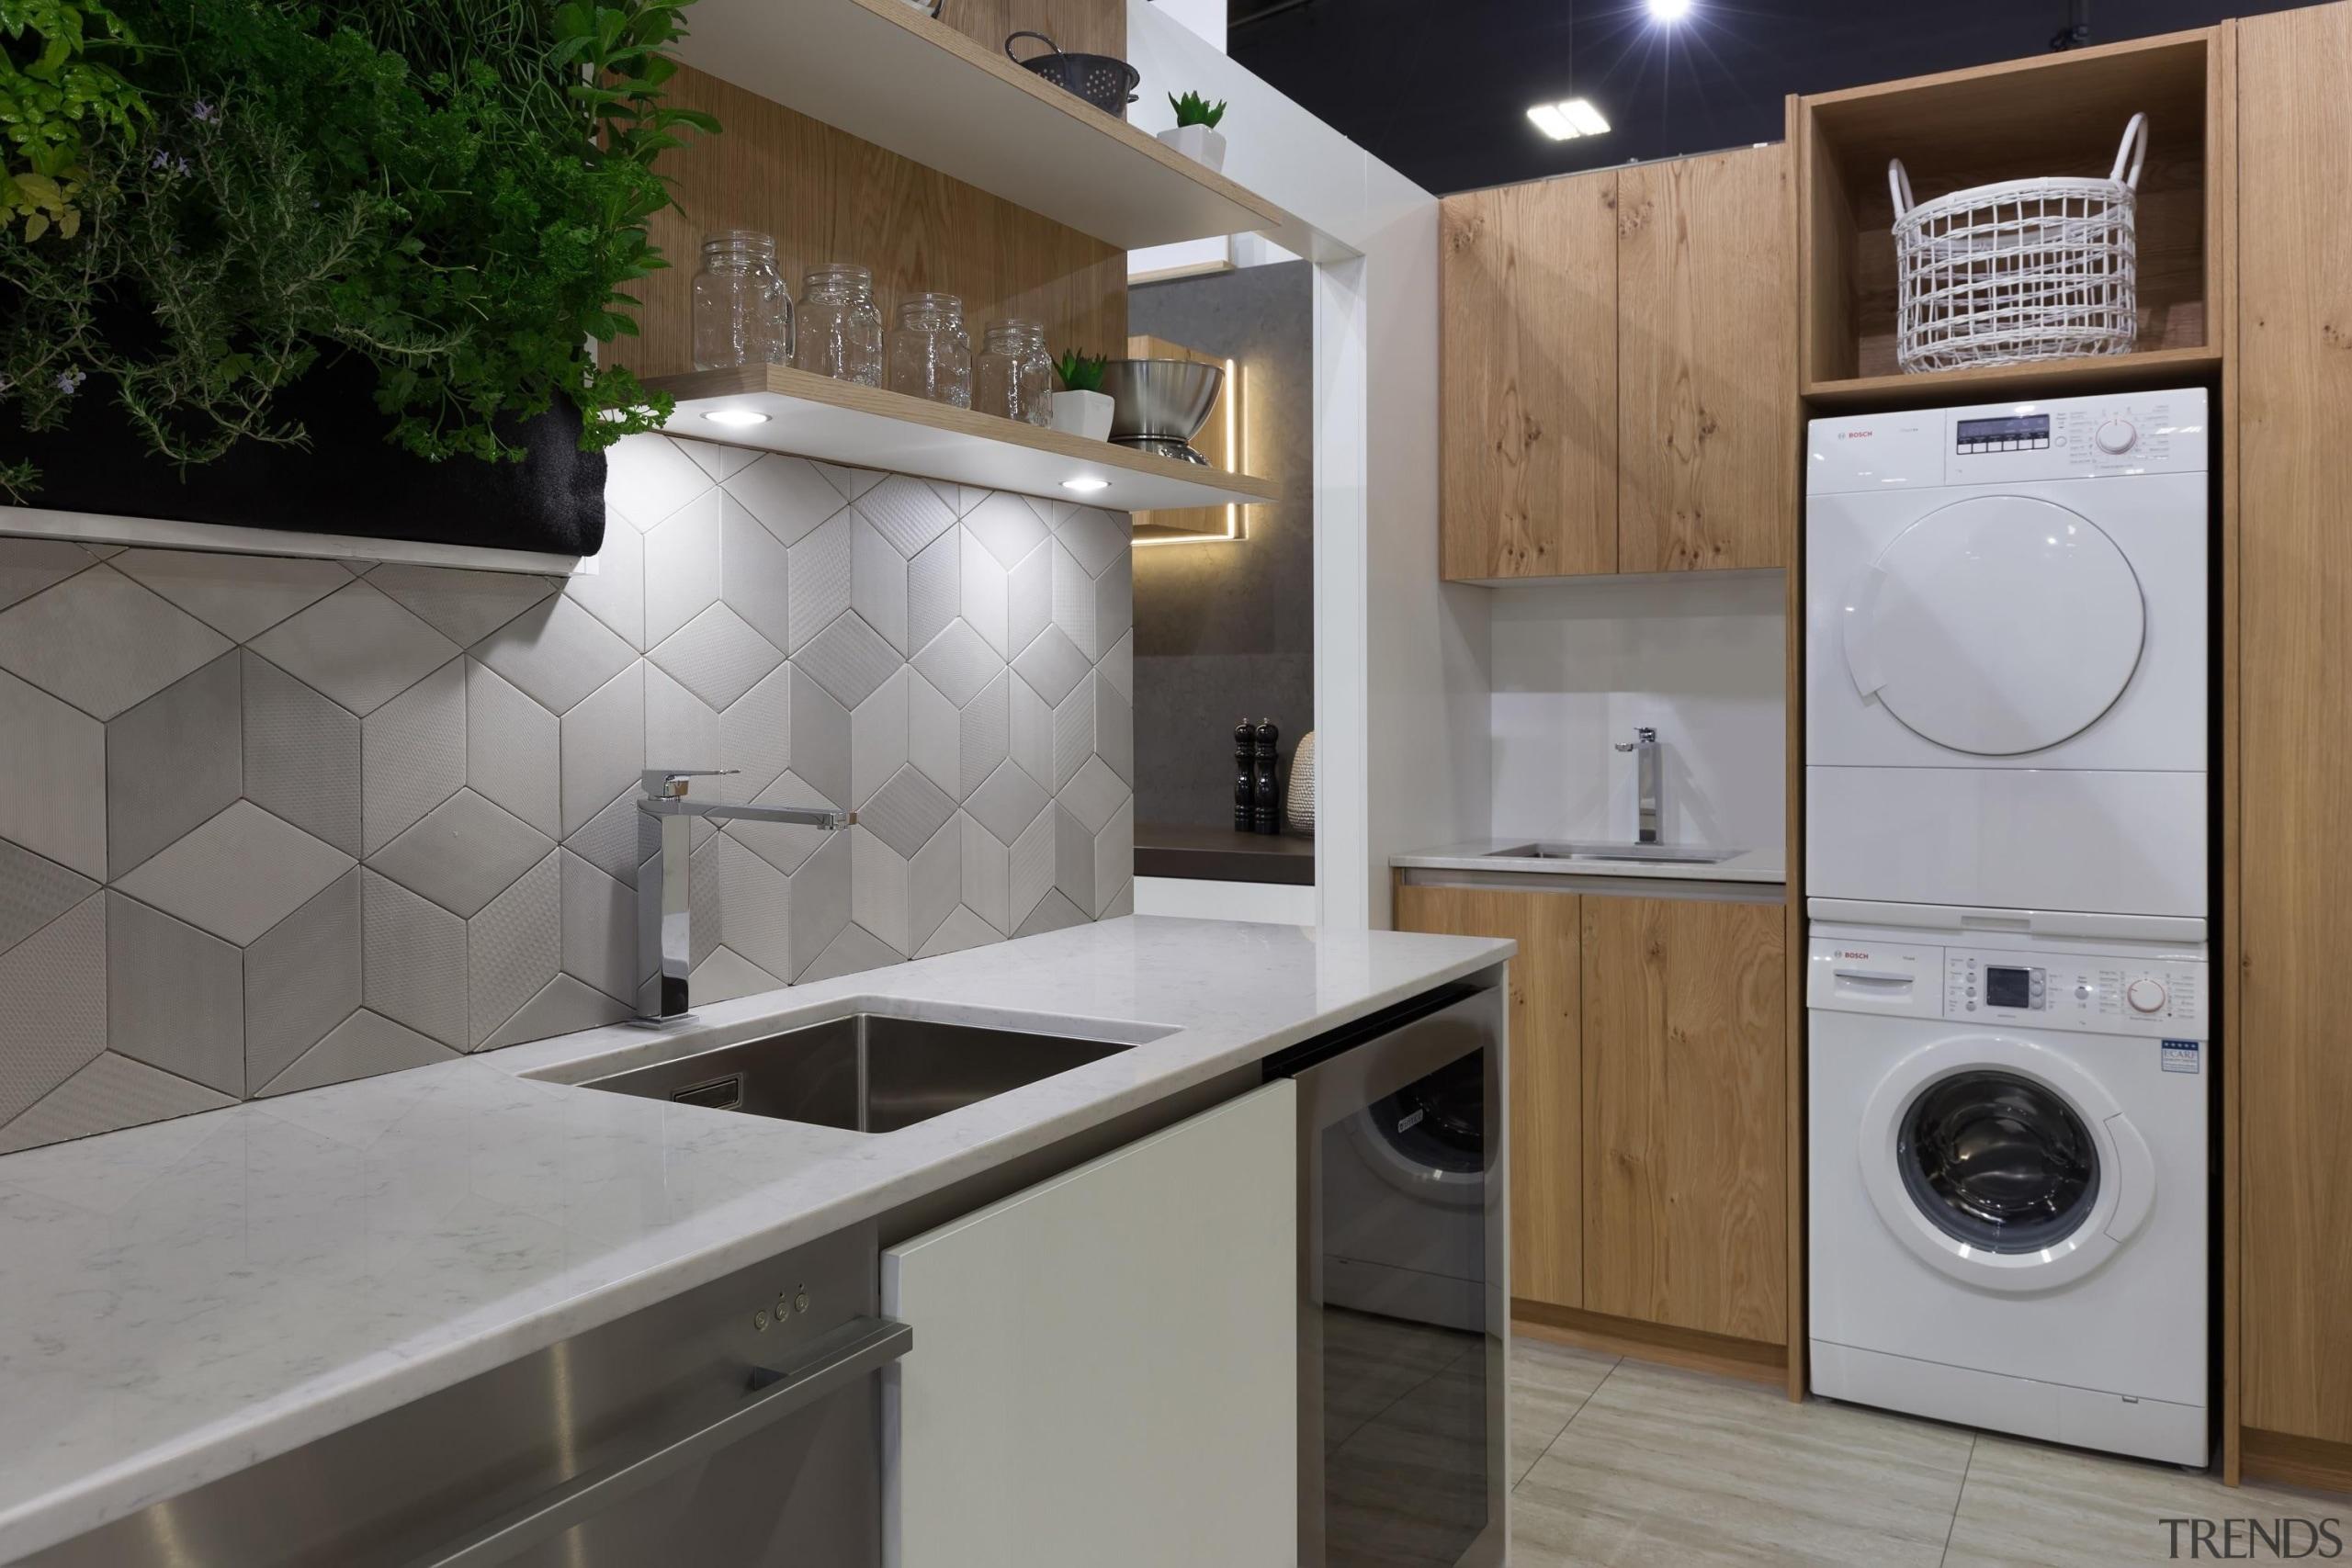 scullery, laundry, veneer, tiled splashback - Home show countertop, home appliance, kitchen, laundry, laundry room, major appliance, room, gray